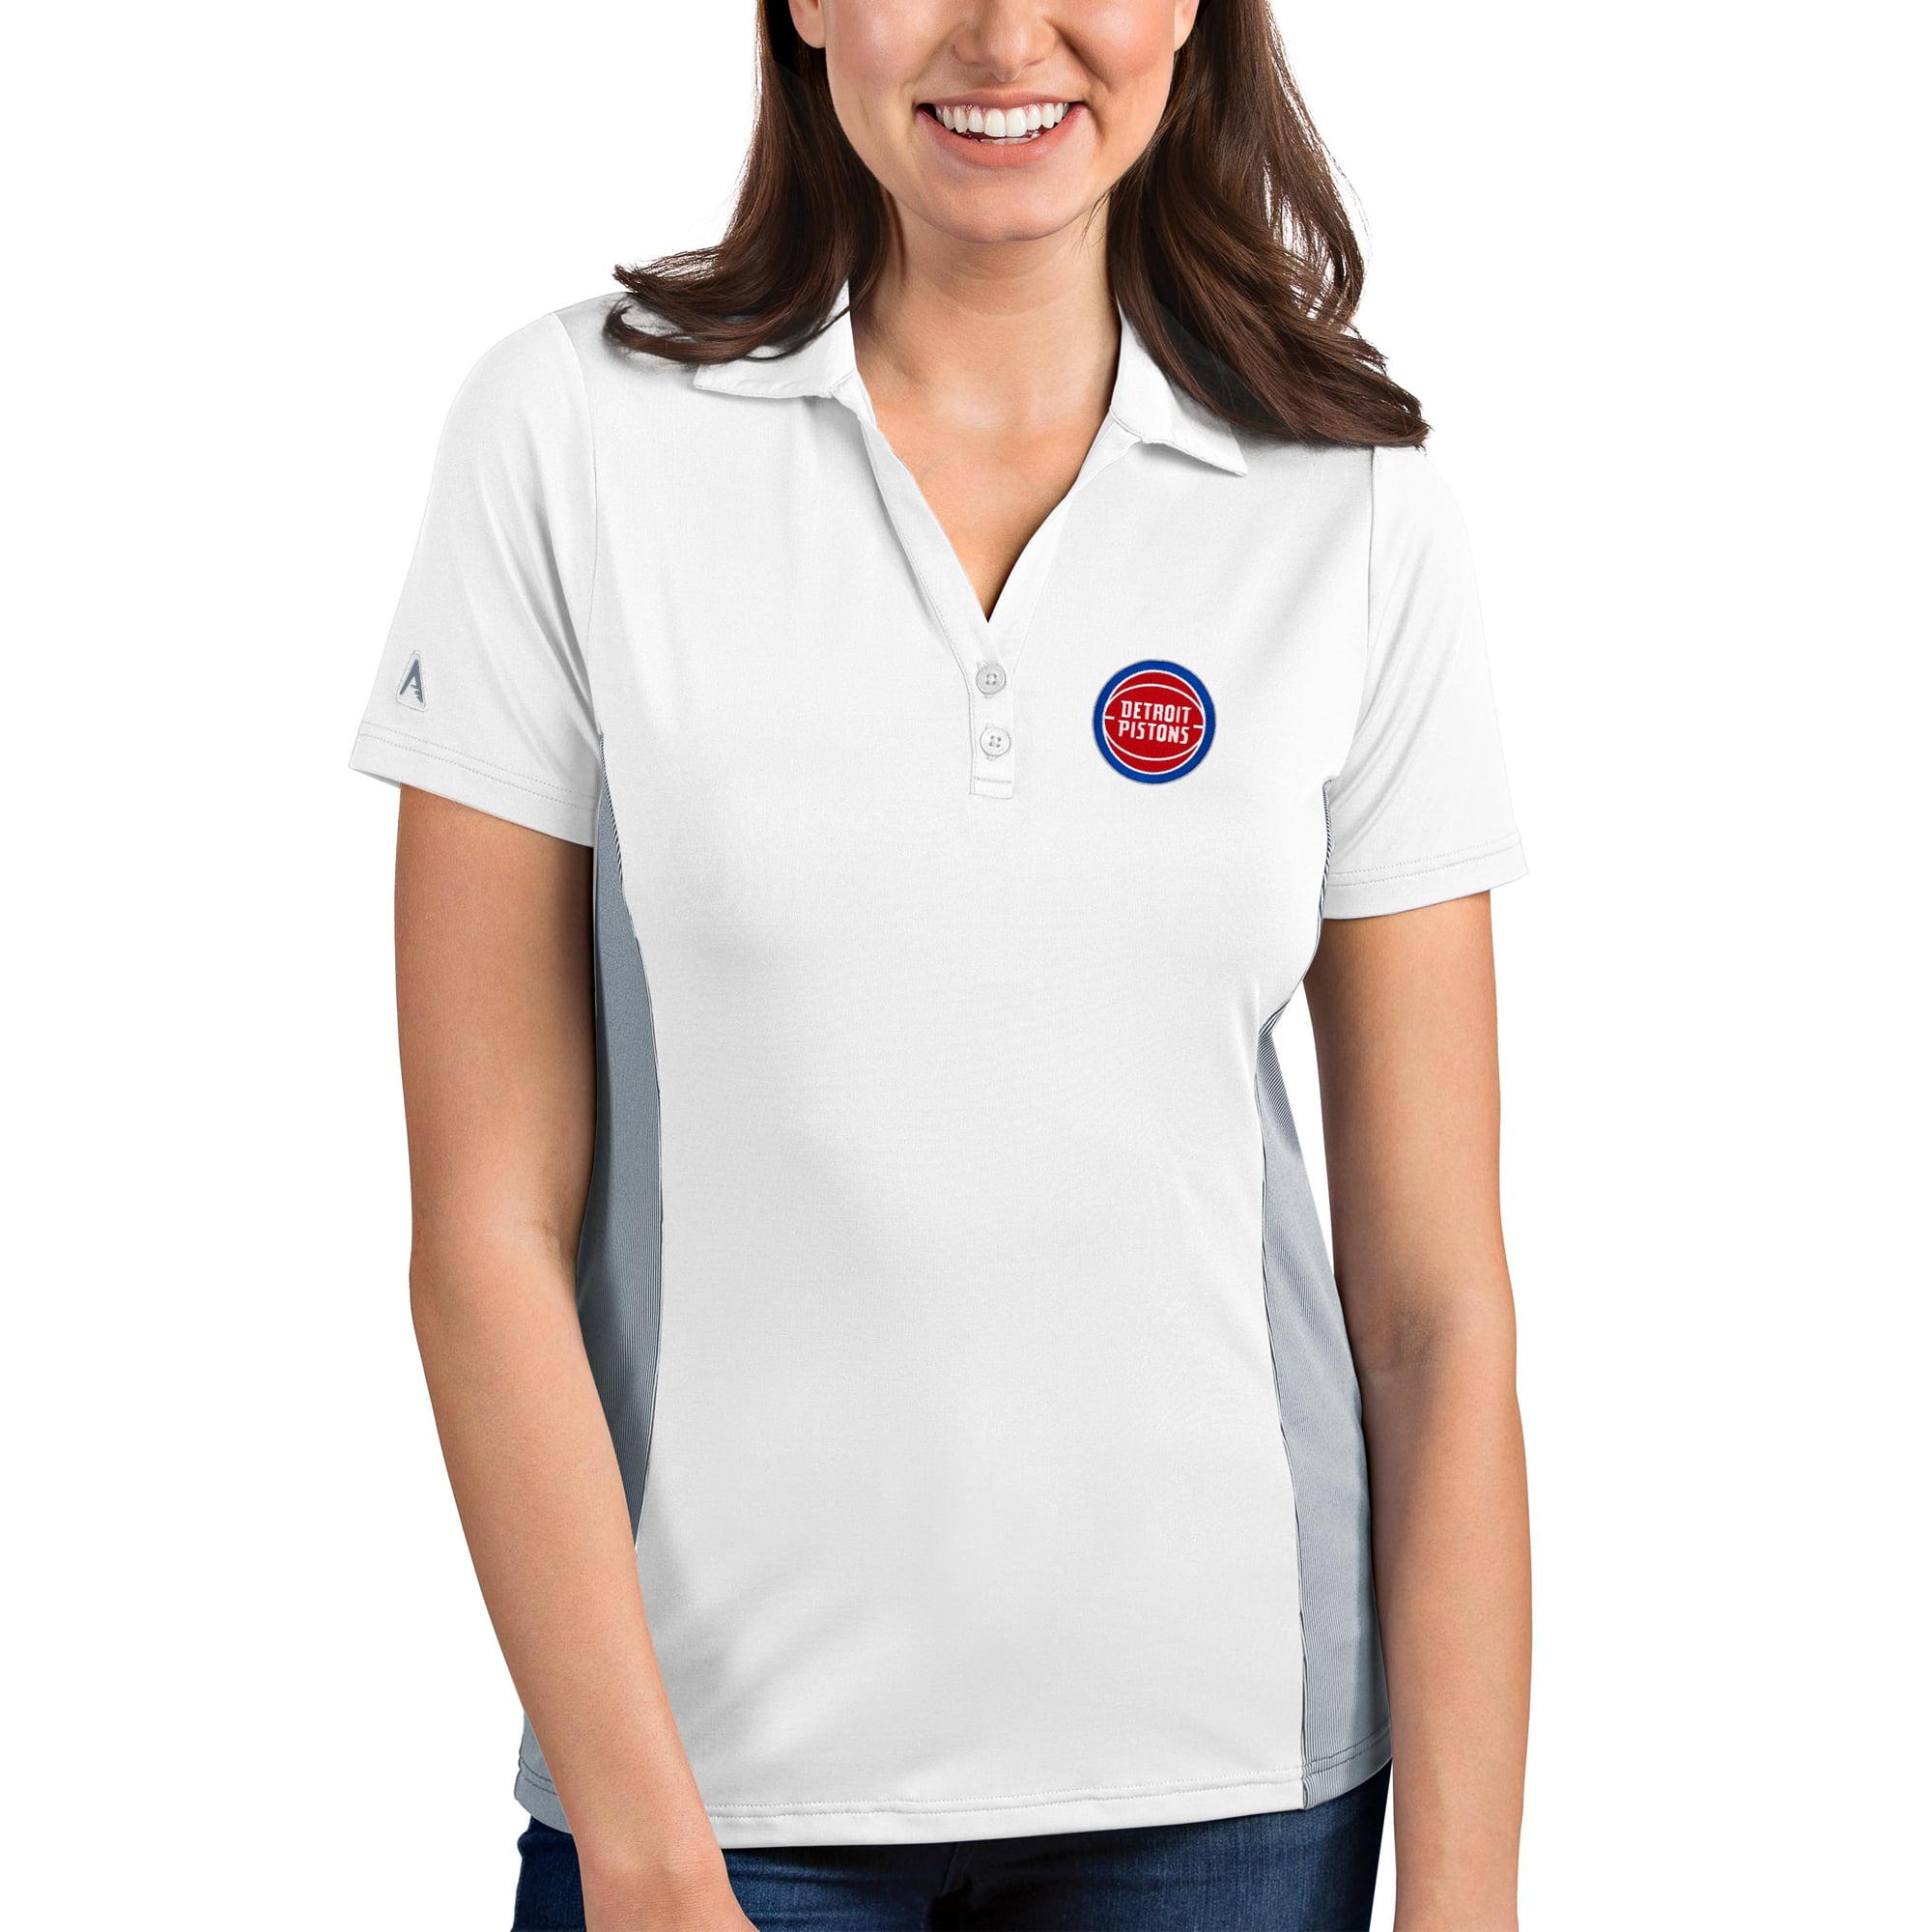 Detroit Pistons Antigua Women's Venture Polo - White/Gray